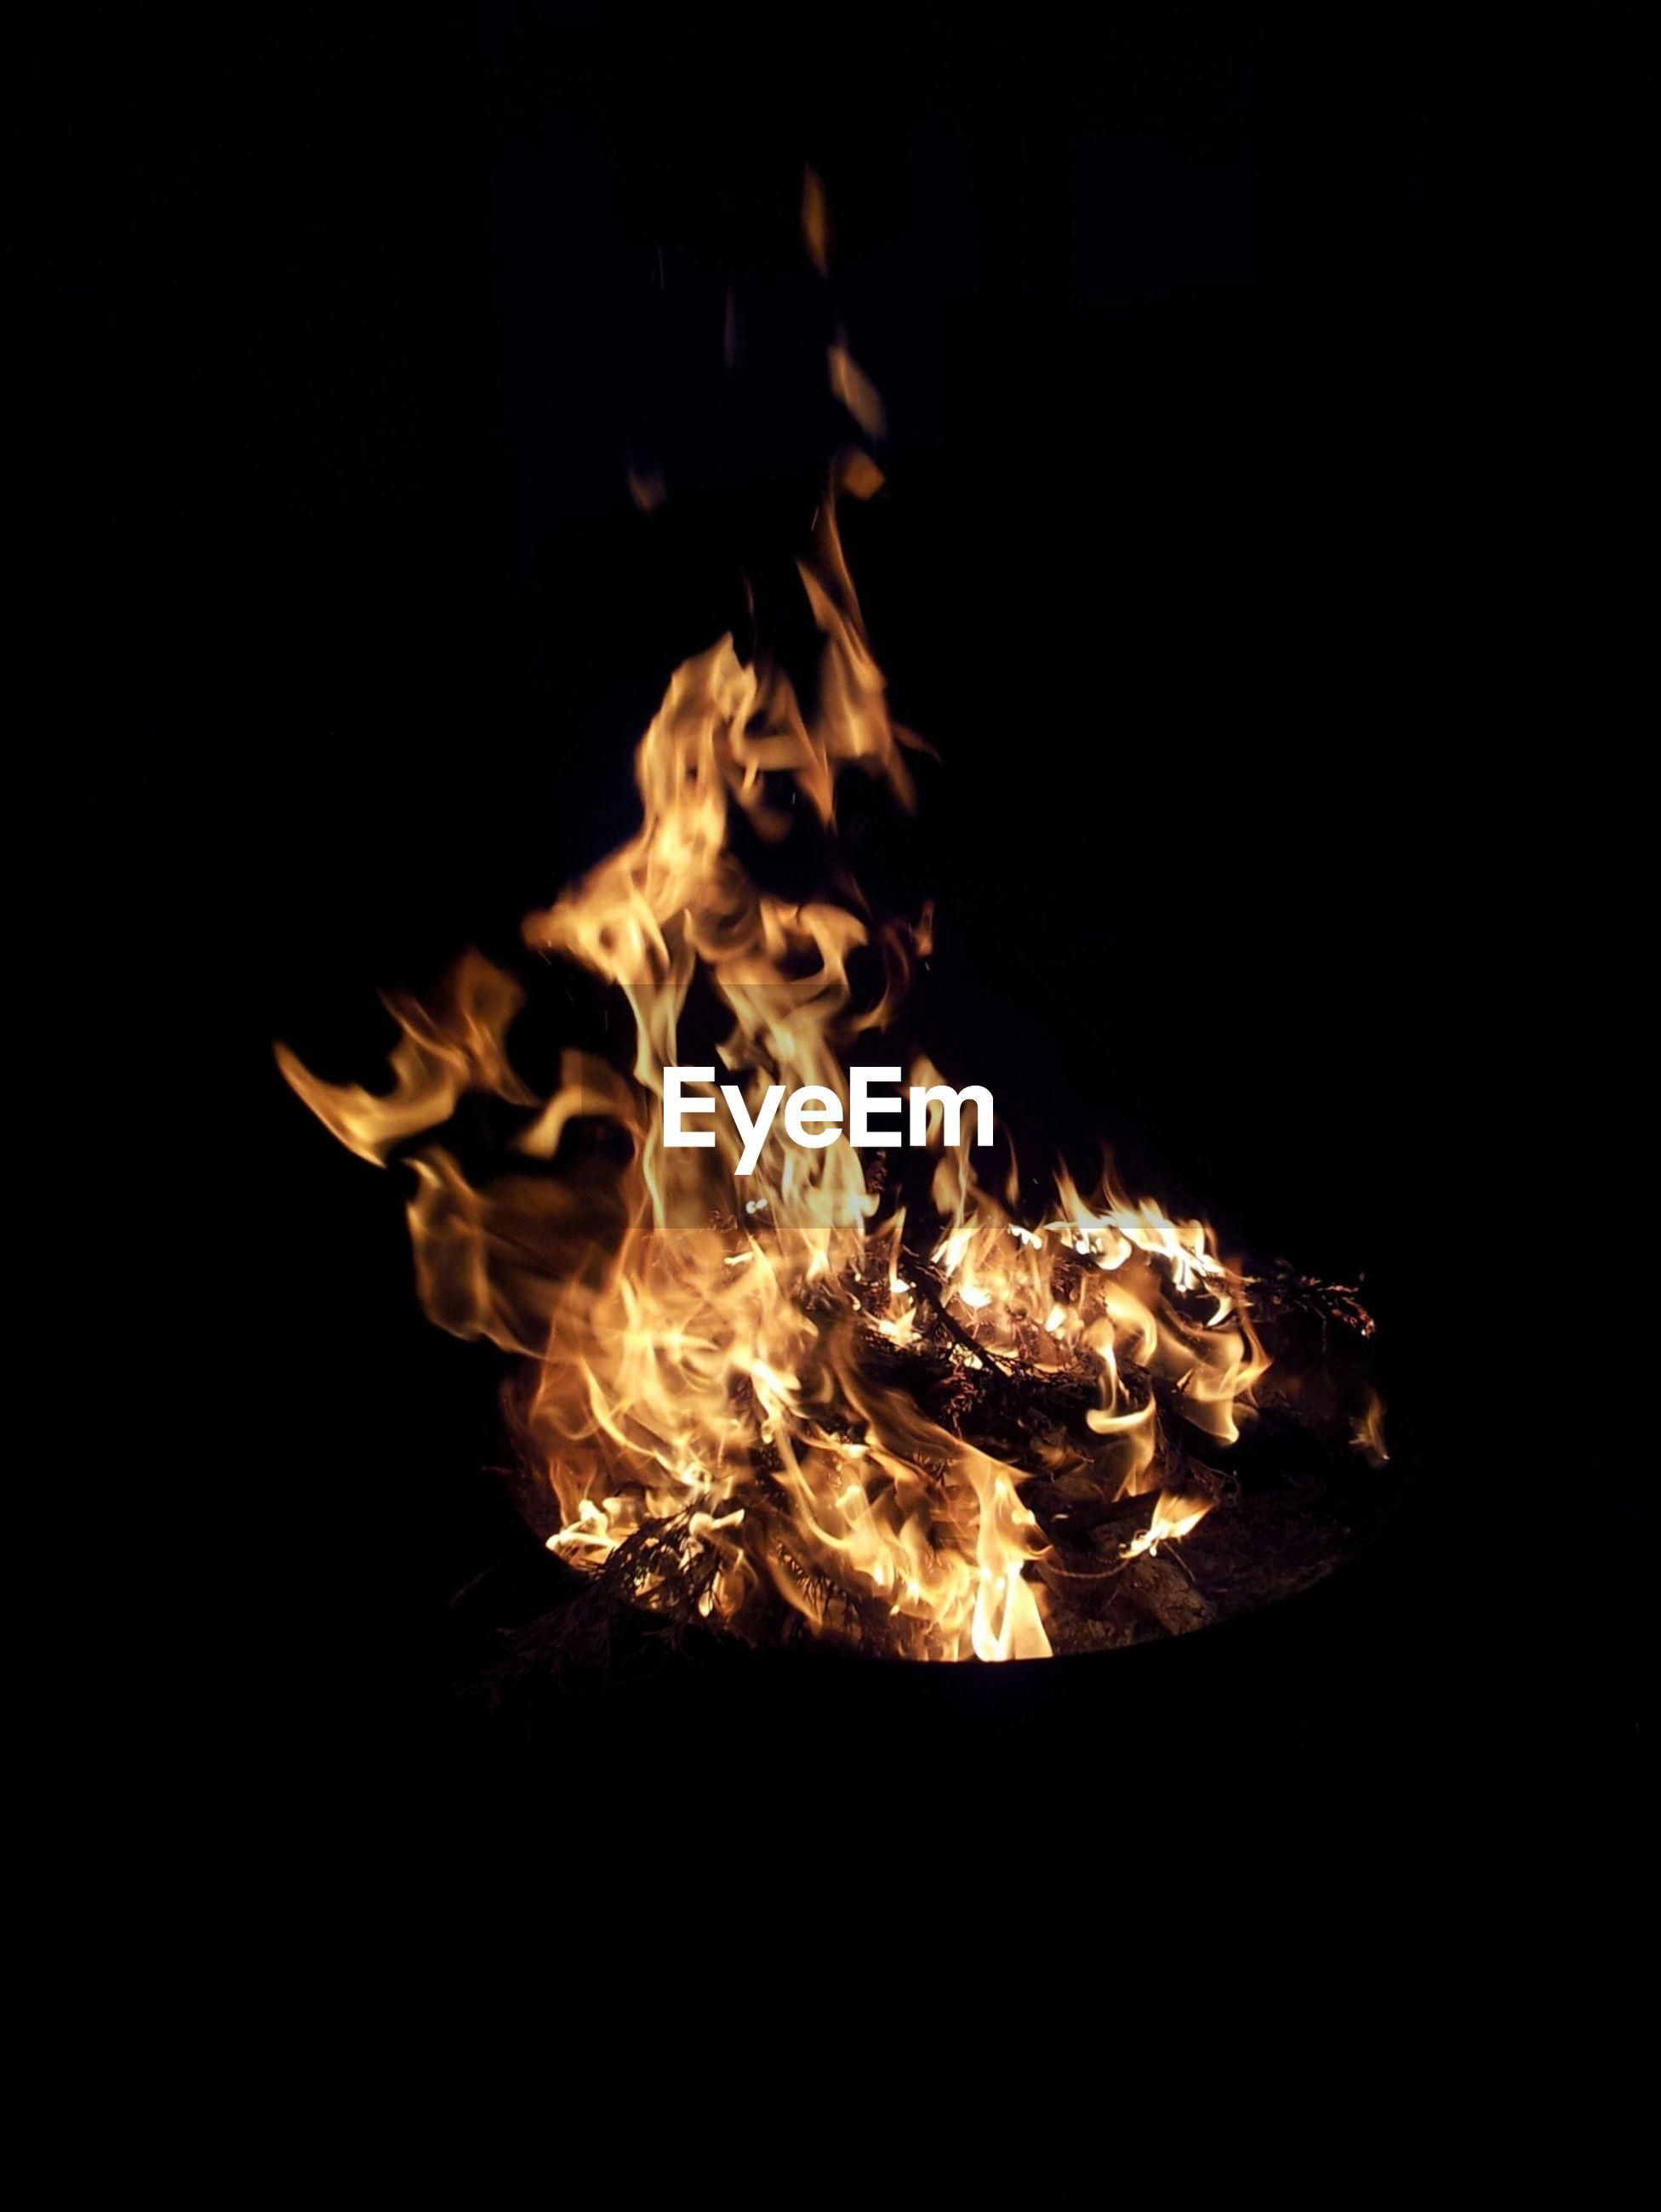 Burning fire against black background